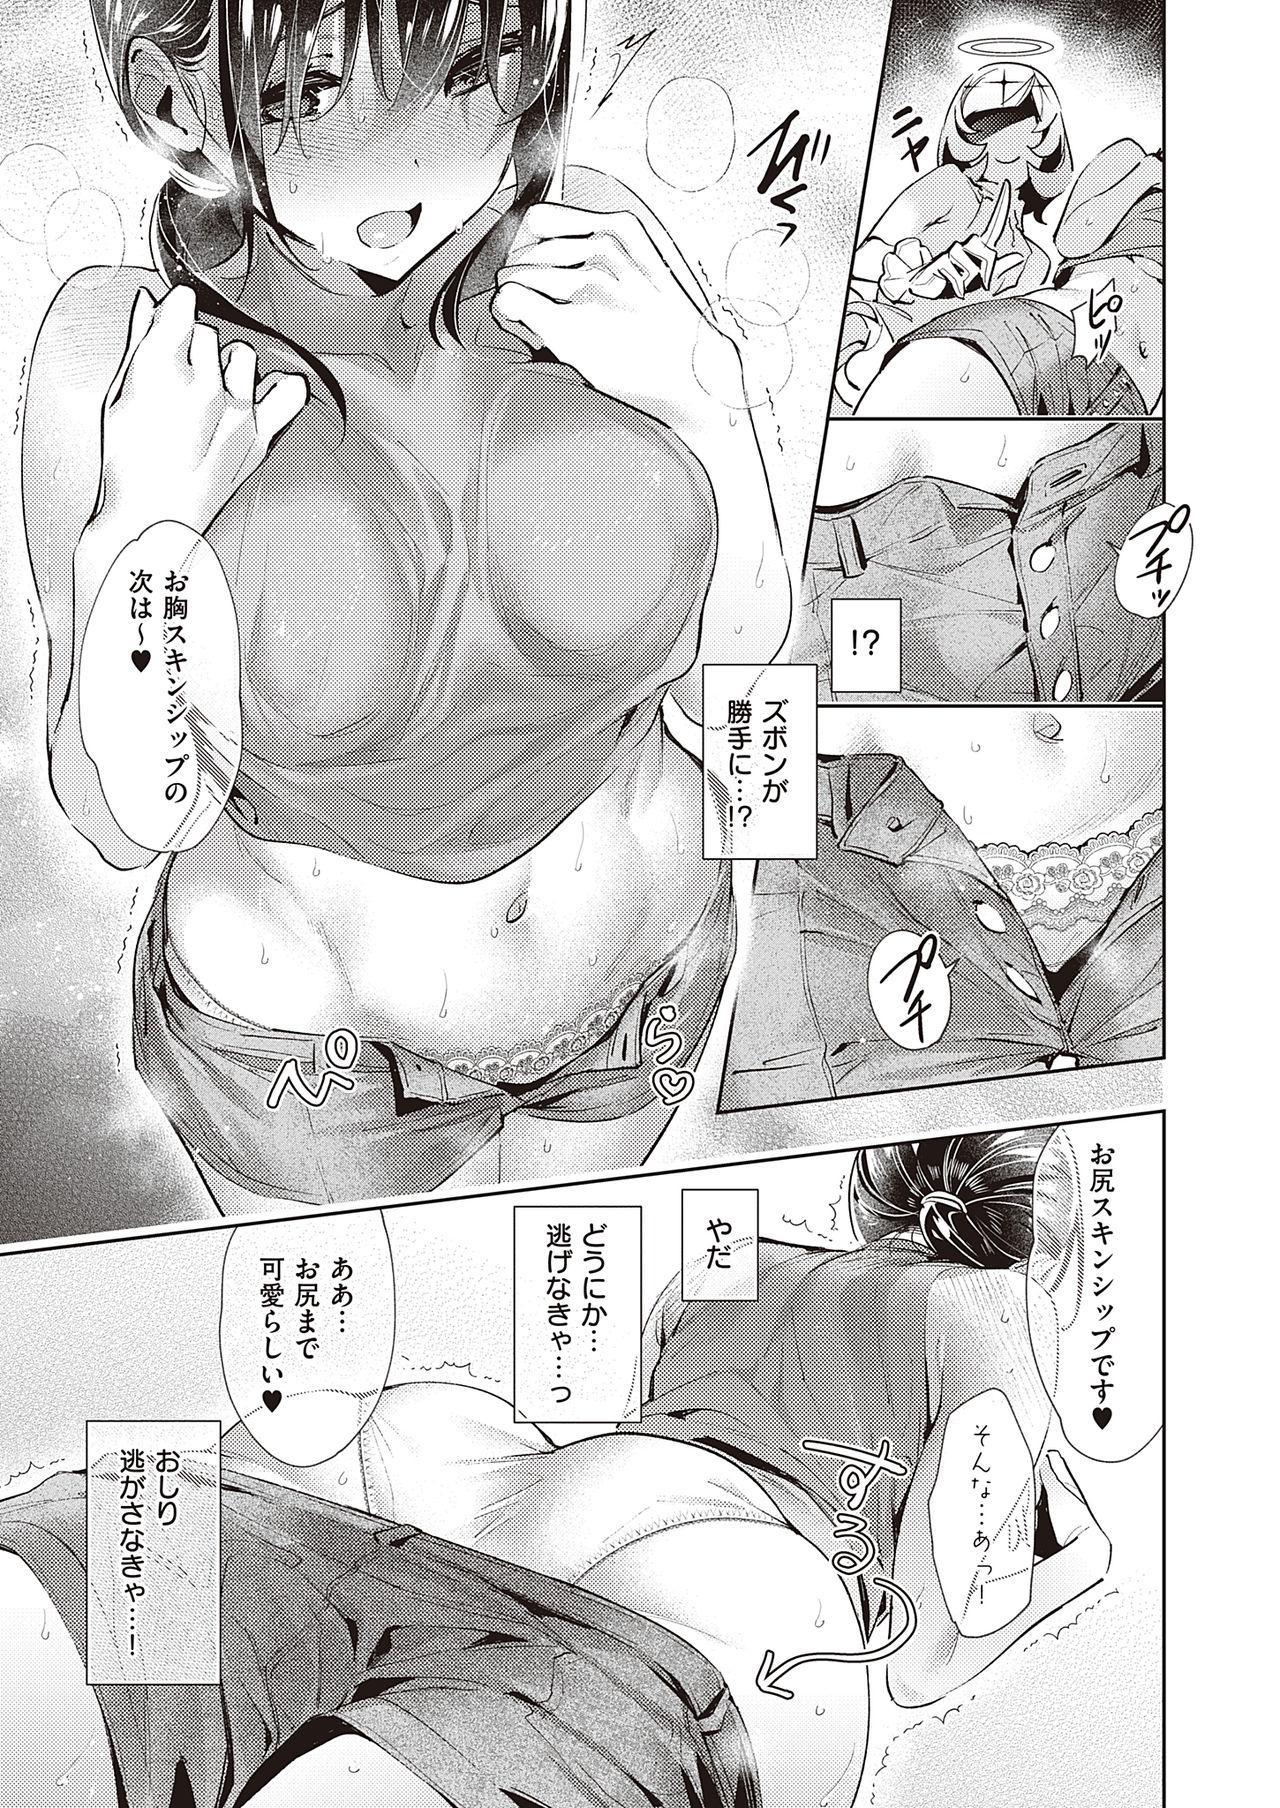 Yokubou Pandora Chapter 13 16